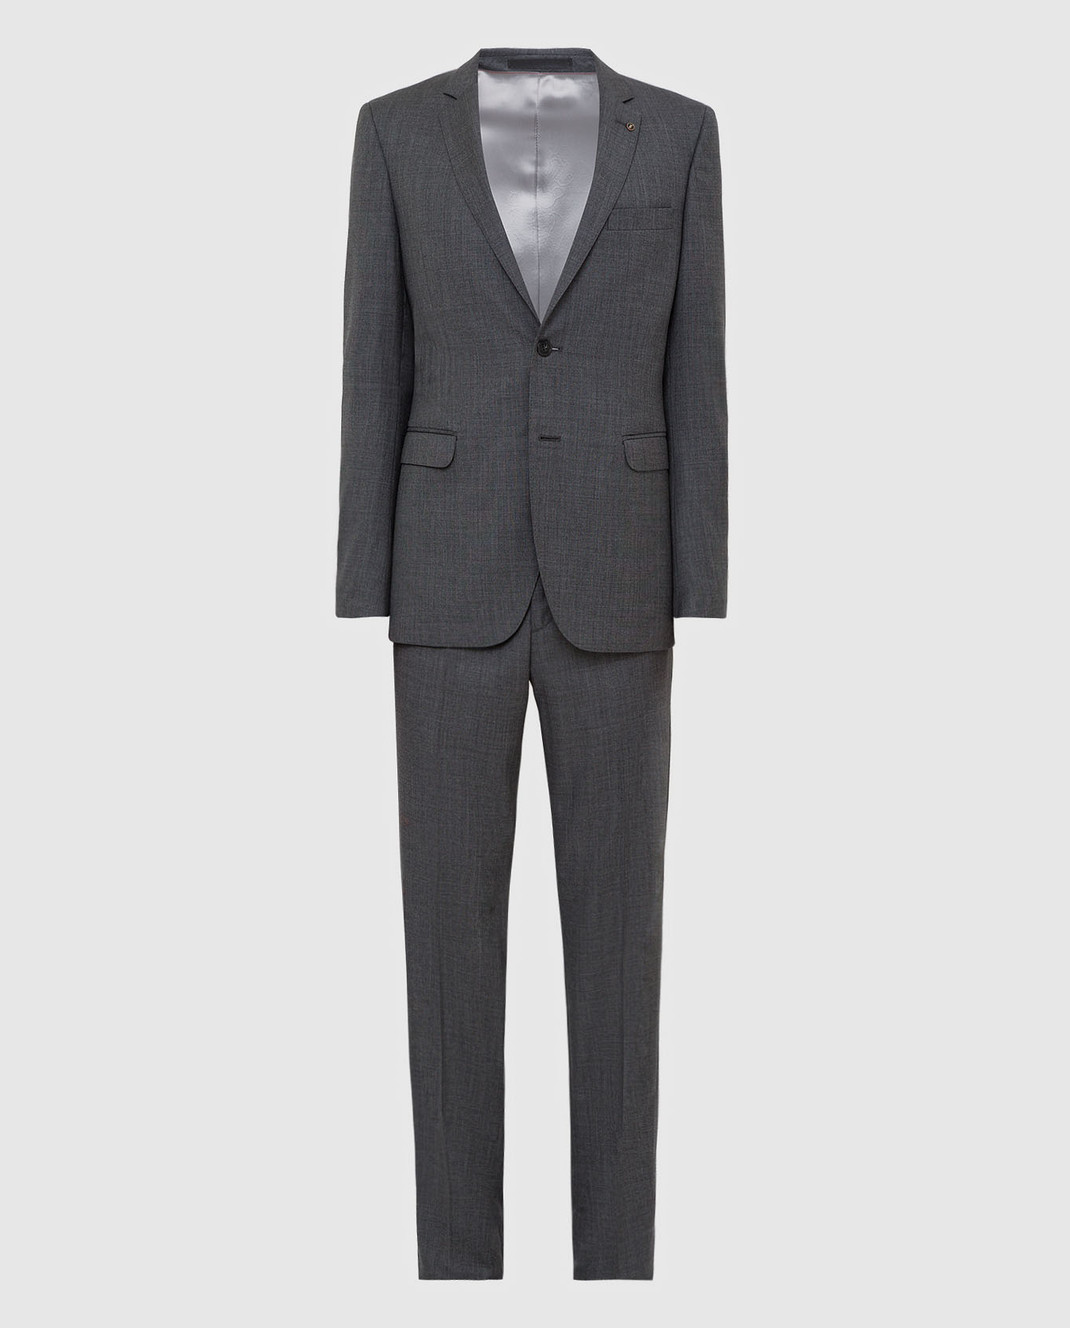 Florentino Темно-серый костюм из шерсти 219852960903